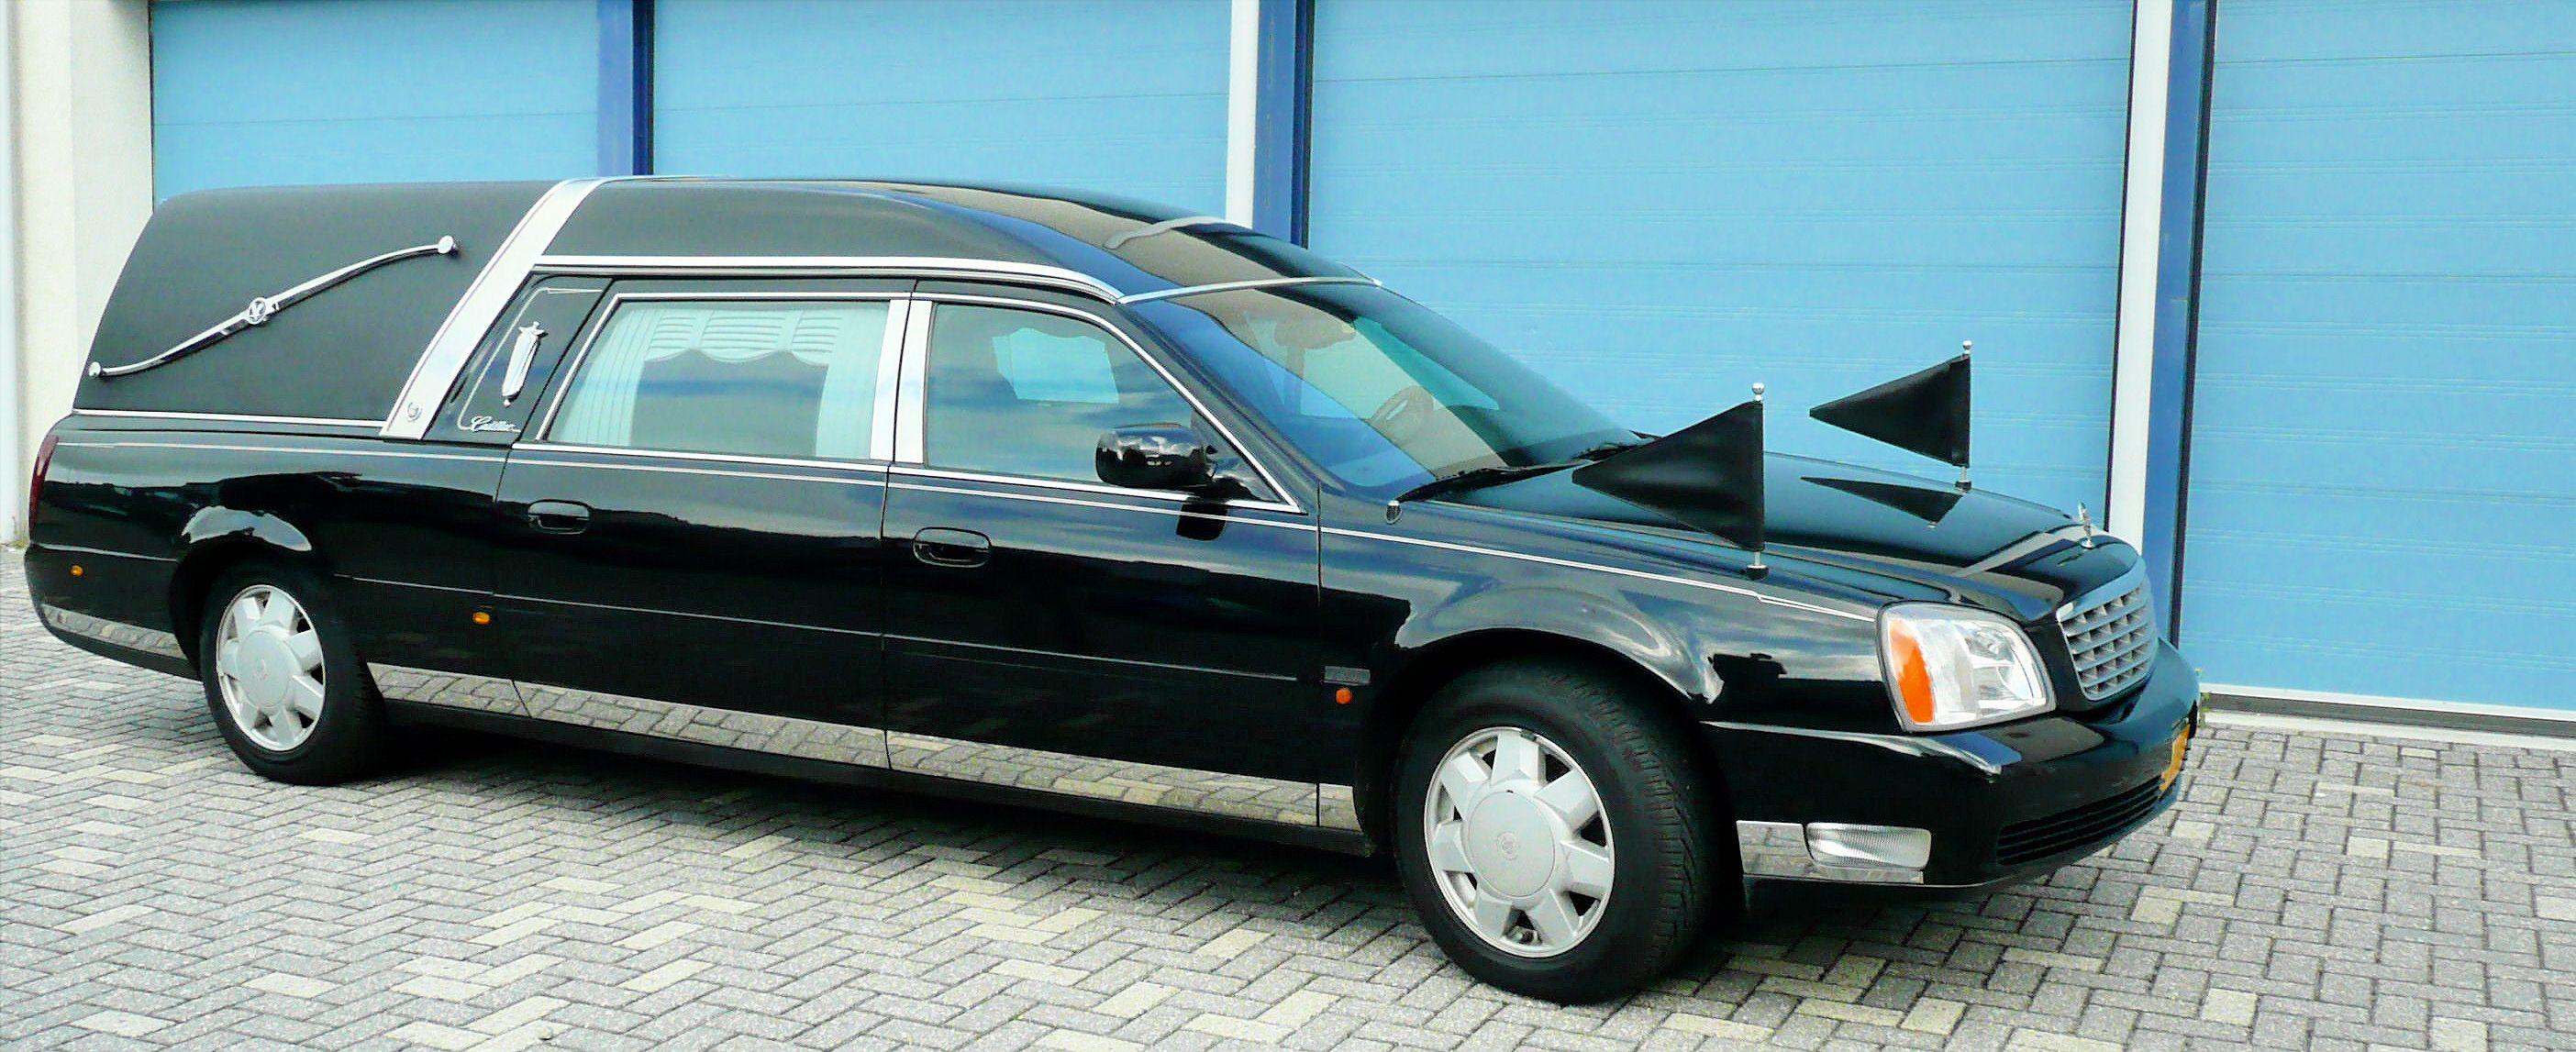 Zwarte rouwauto - Cadillac